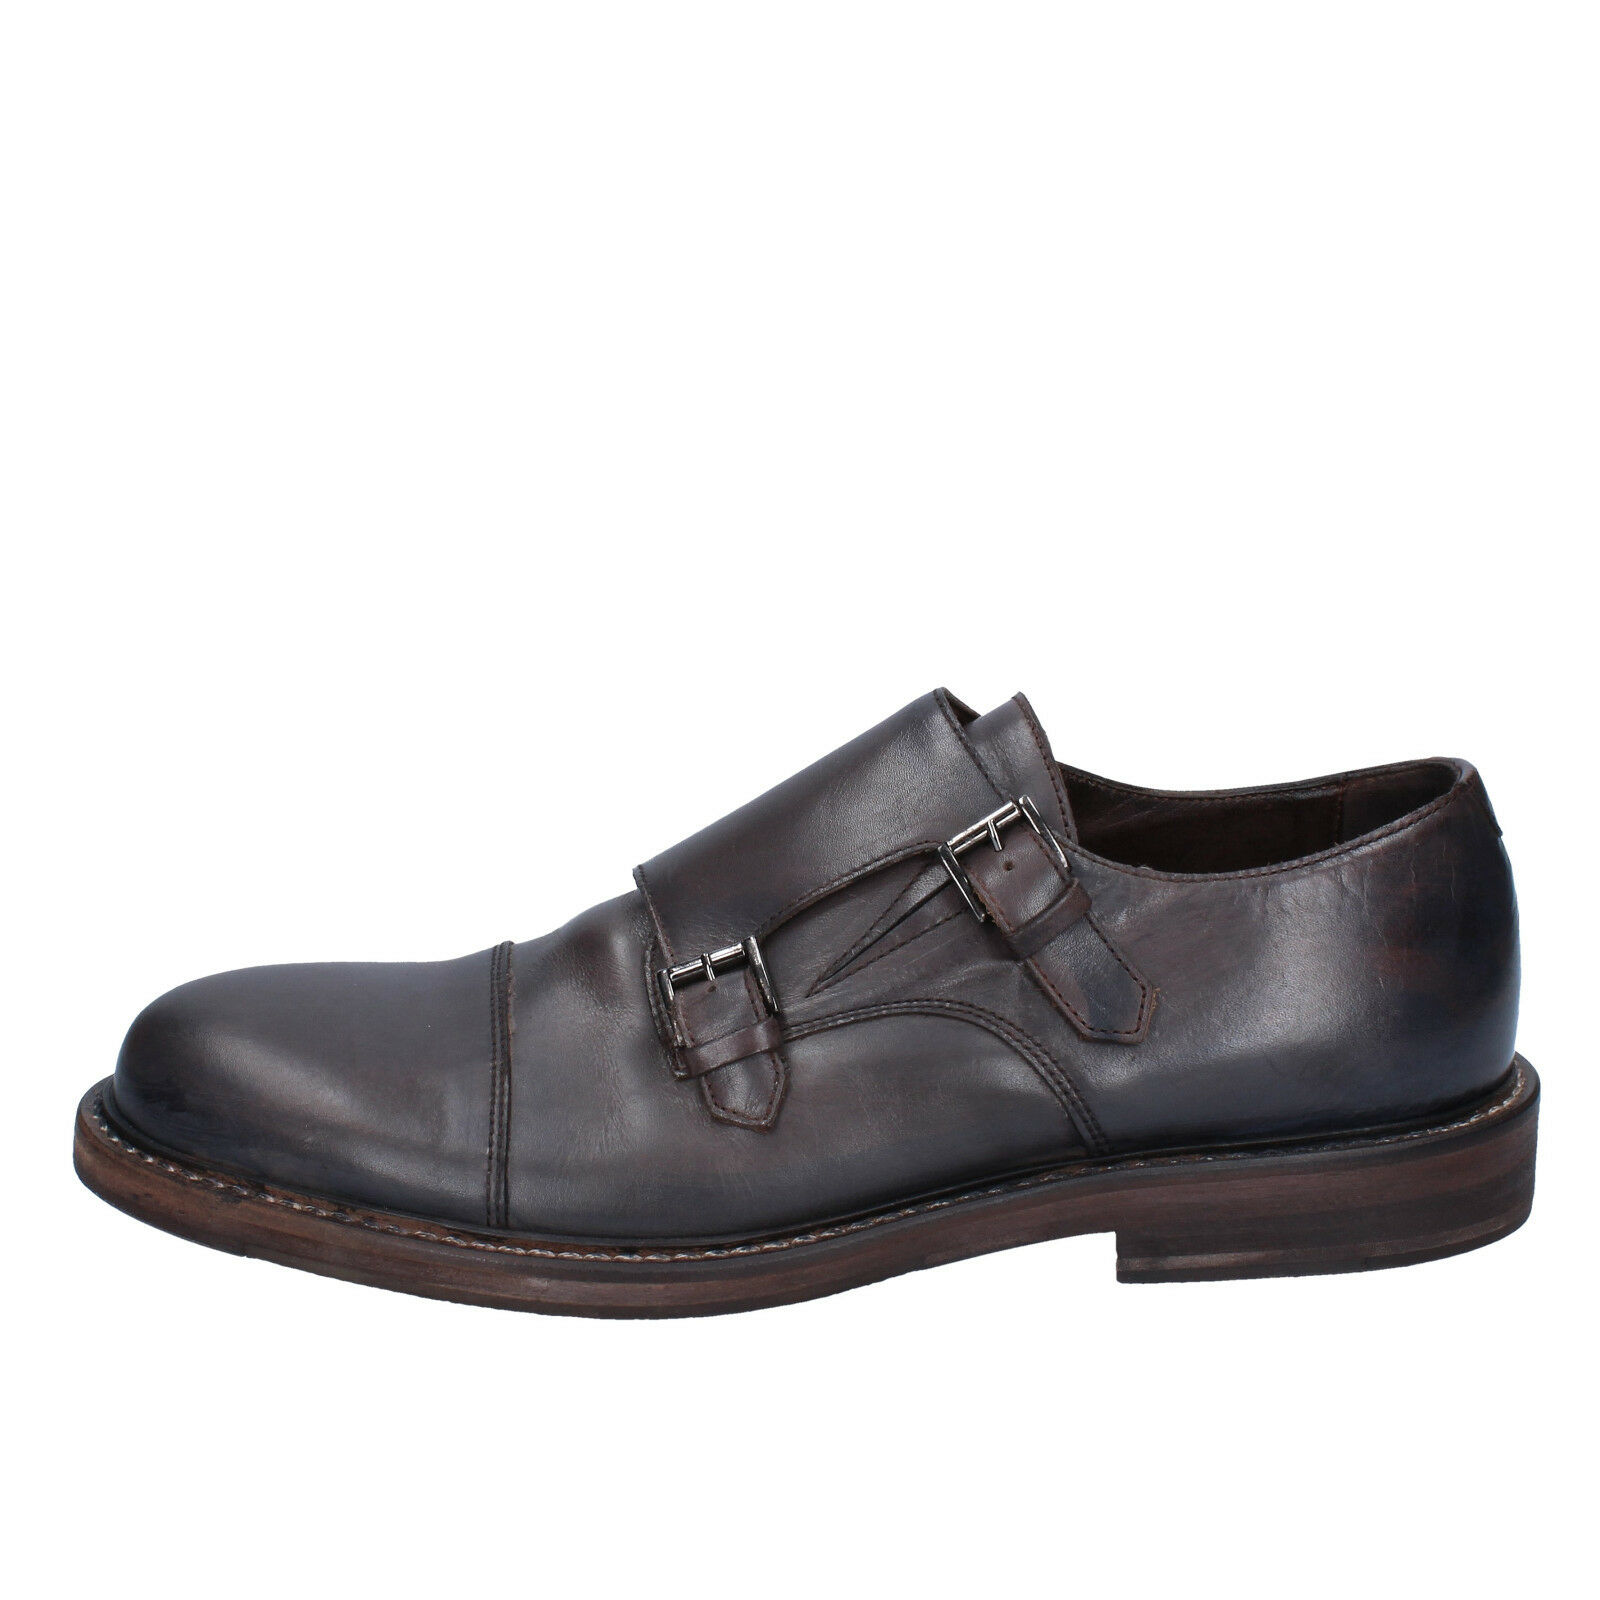 men's shoes ROBERTO BOTTICELLI 8 () elegant dark brown leather BY584-41